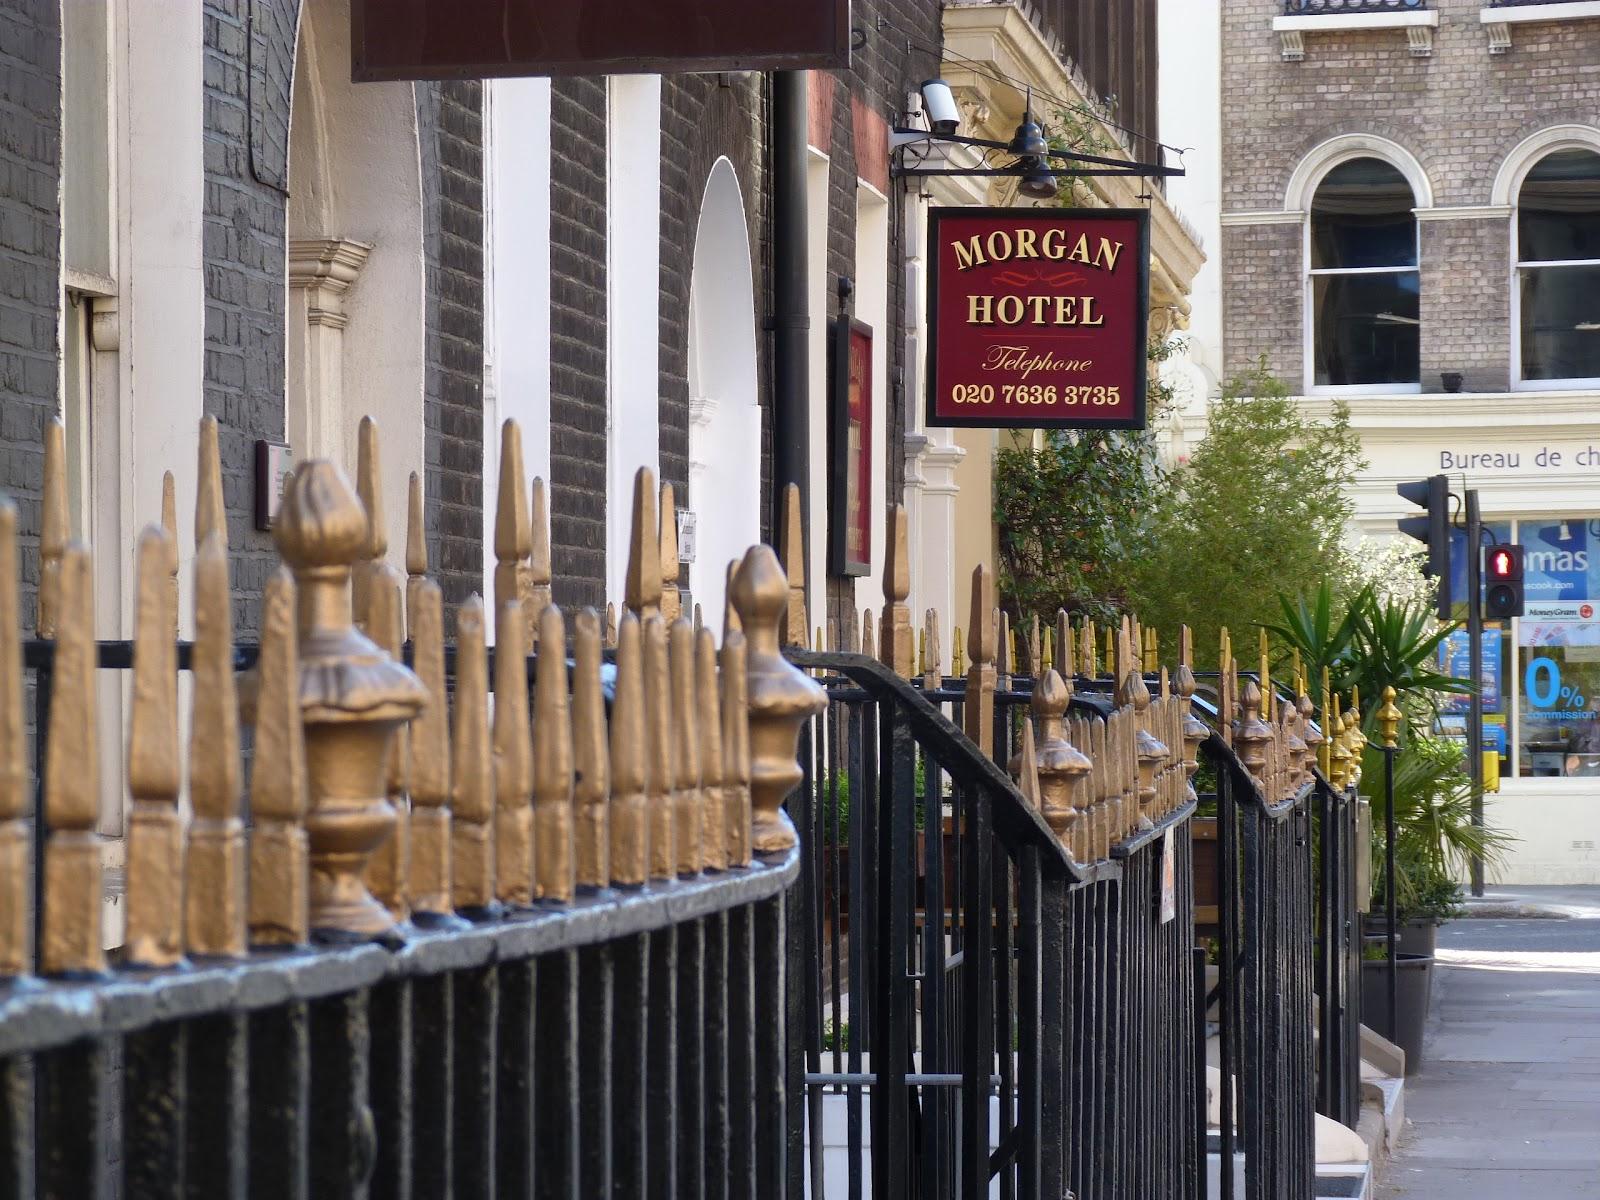 London railings and the Morgan Hotel